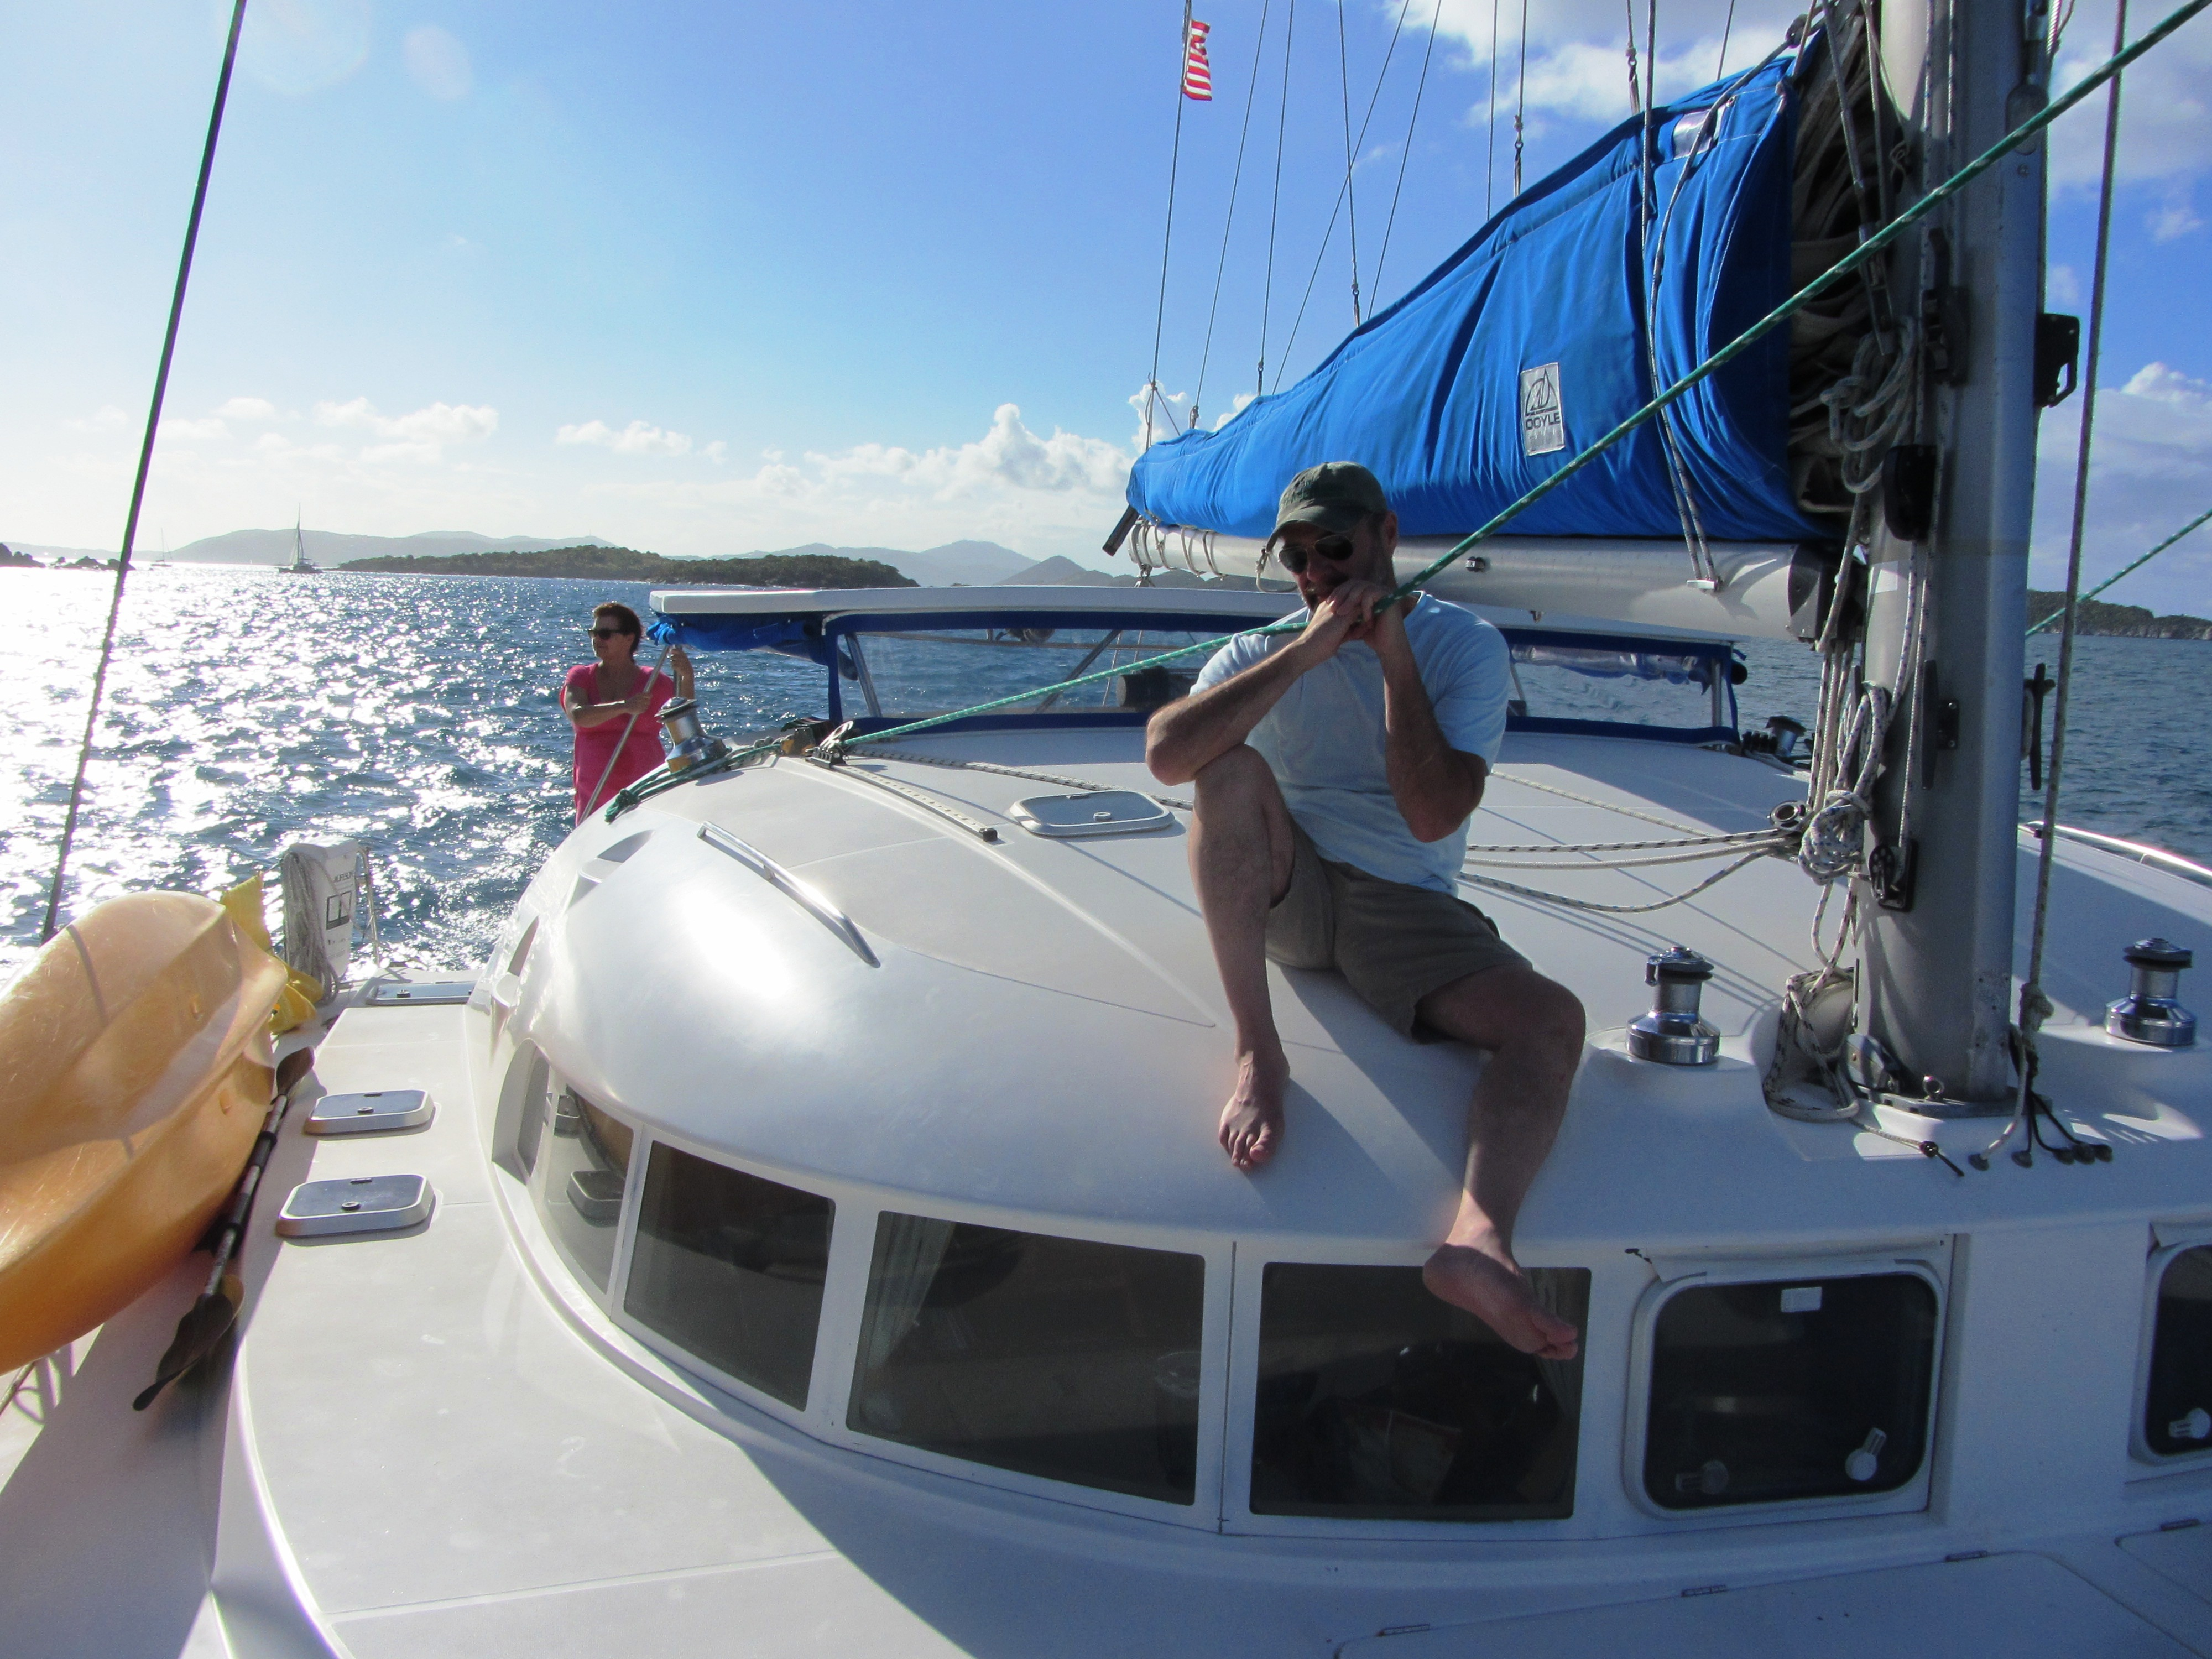 Loving the boat life